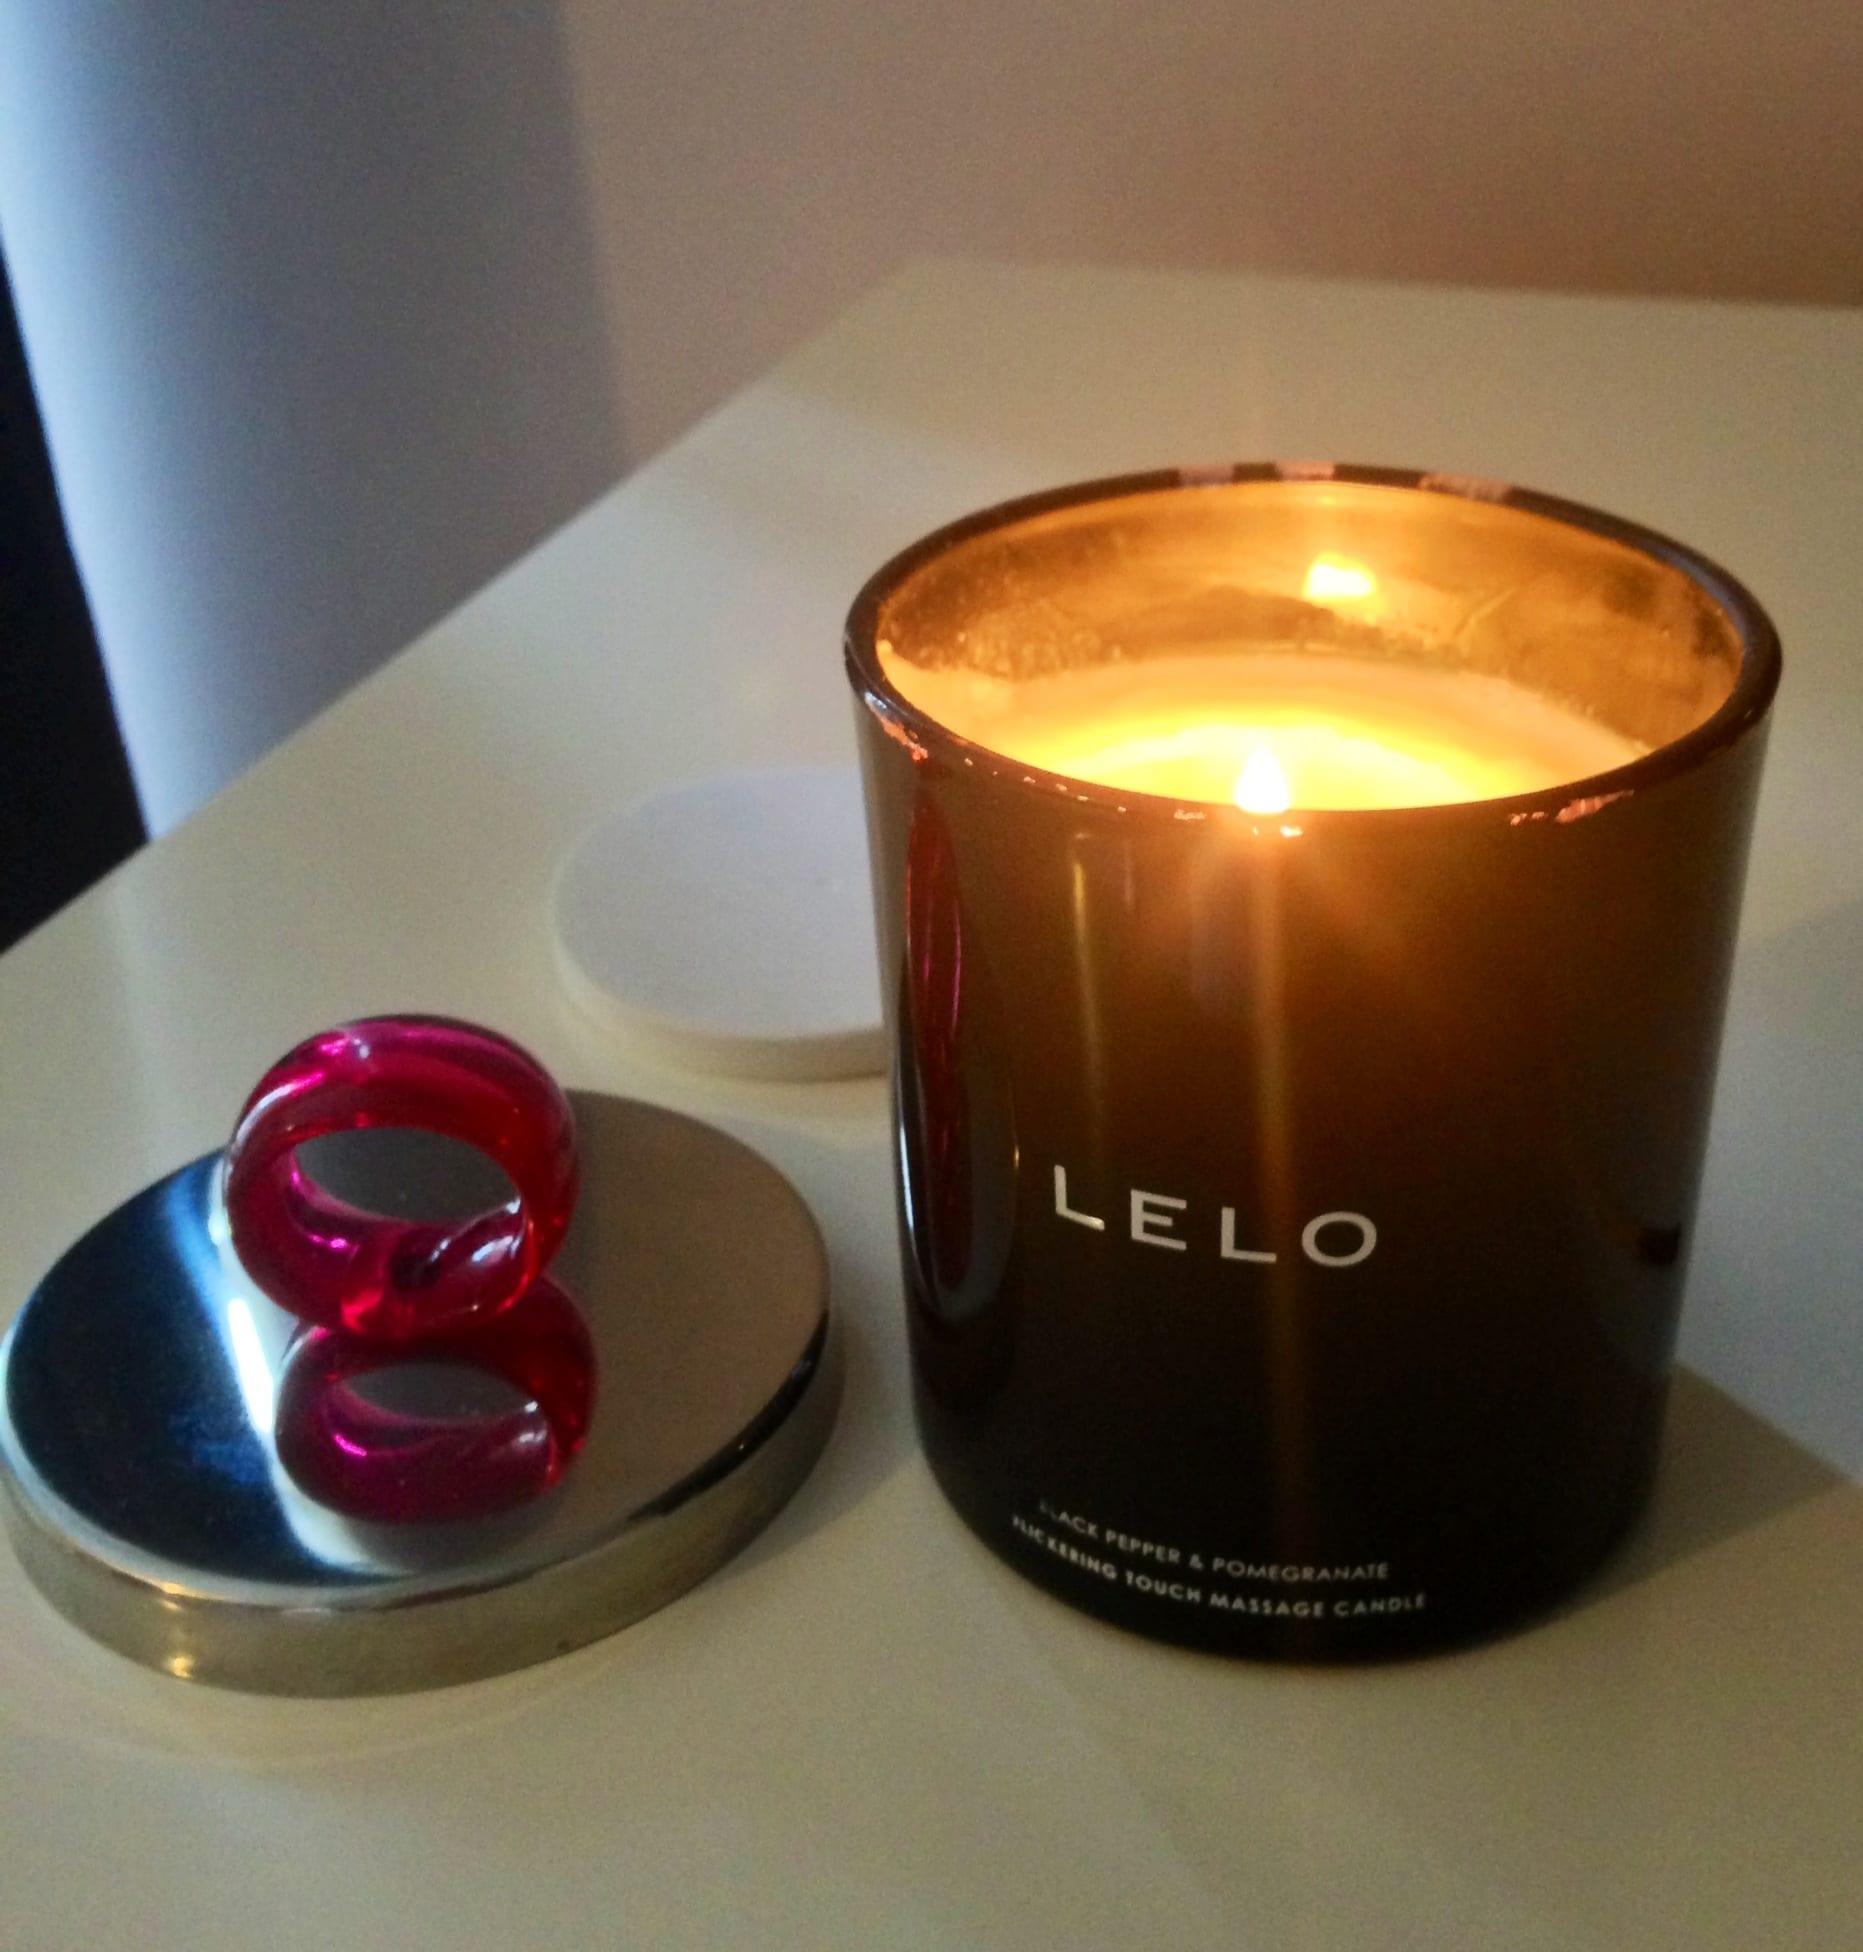 The LELO candle lit